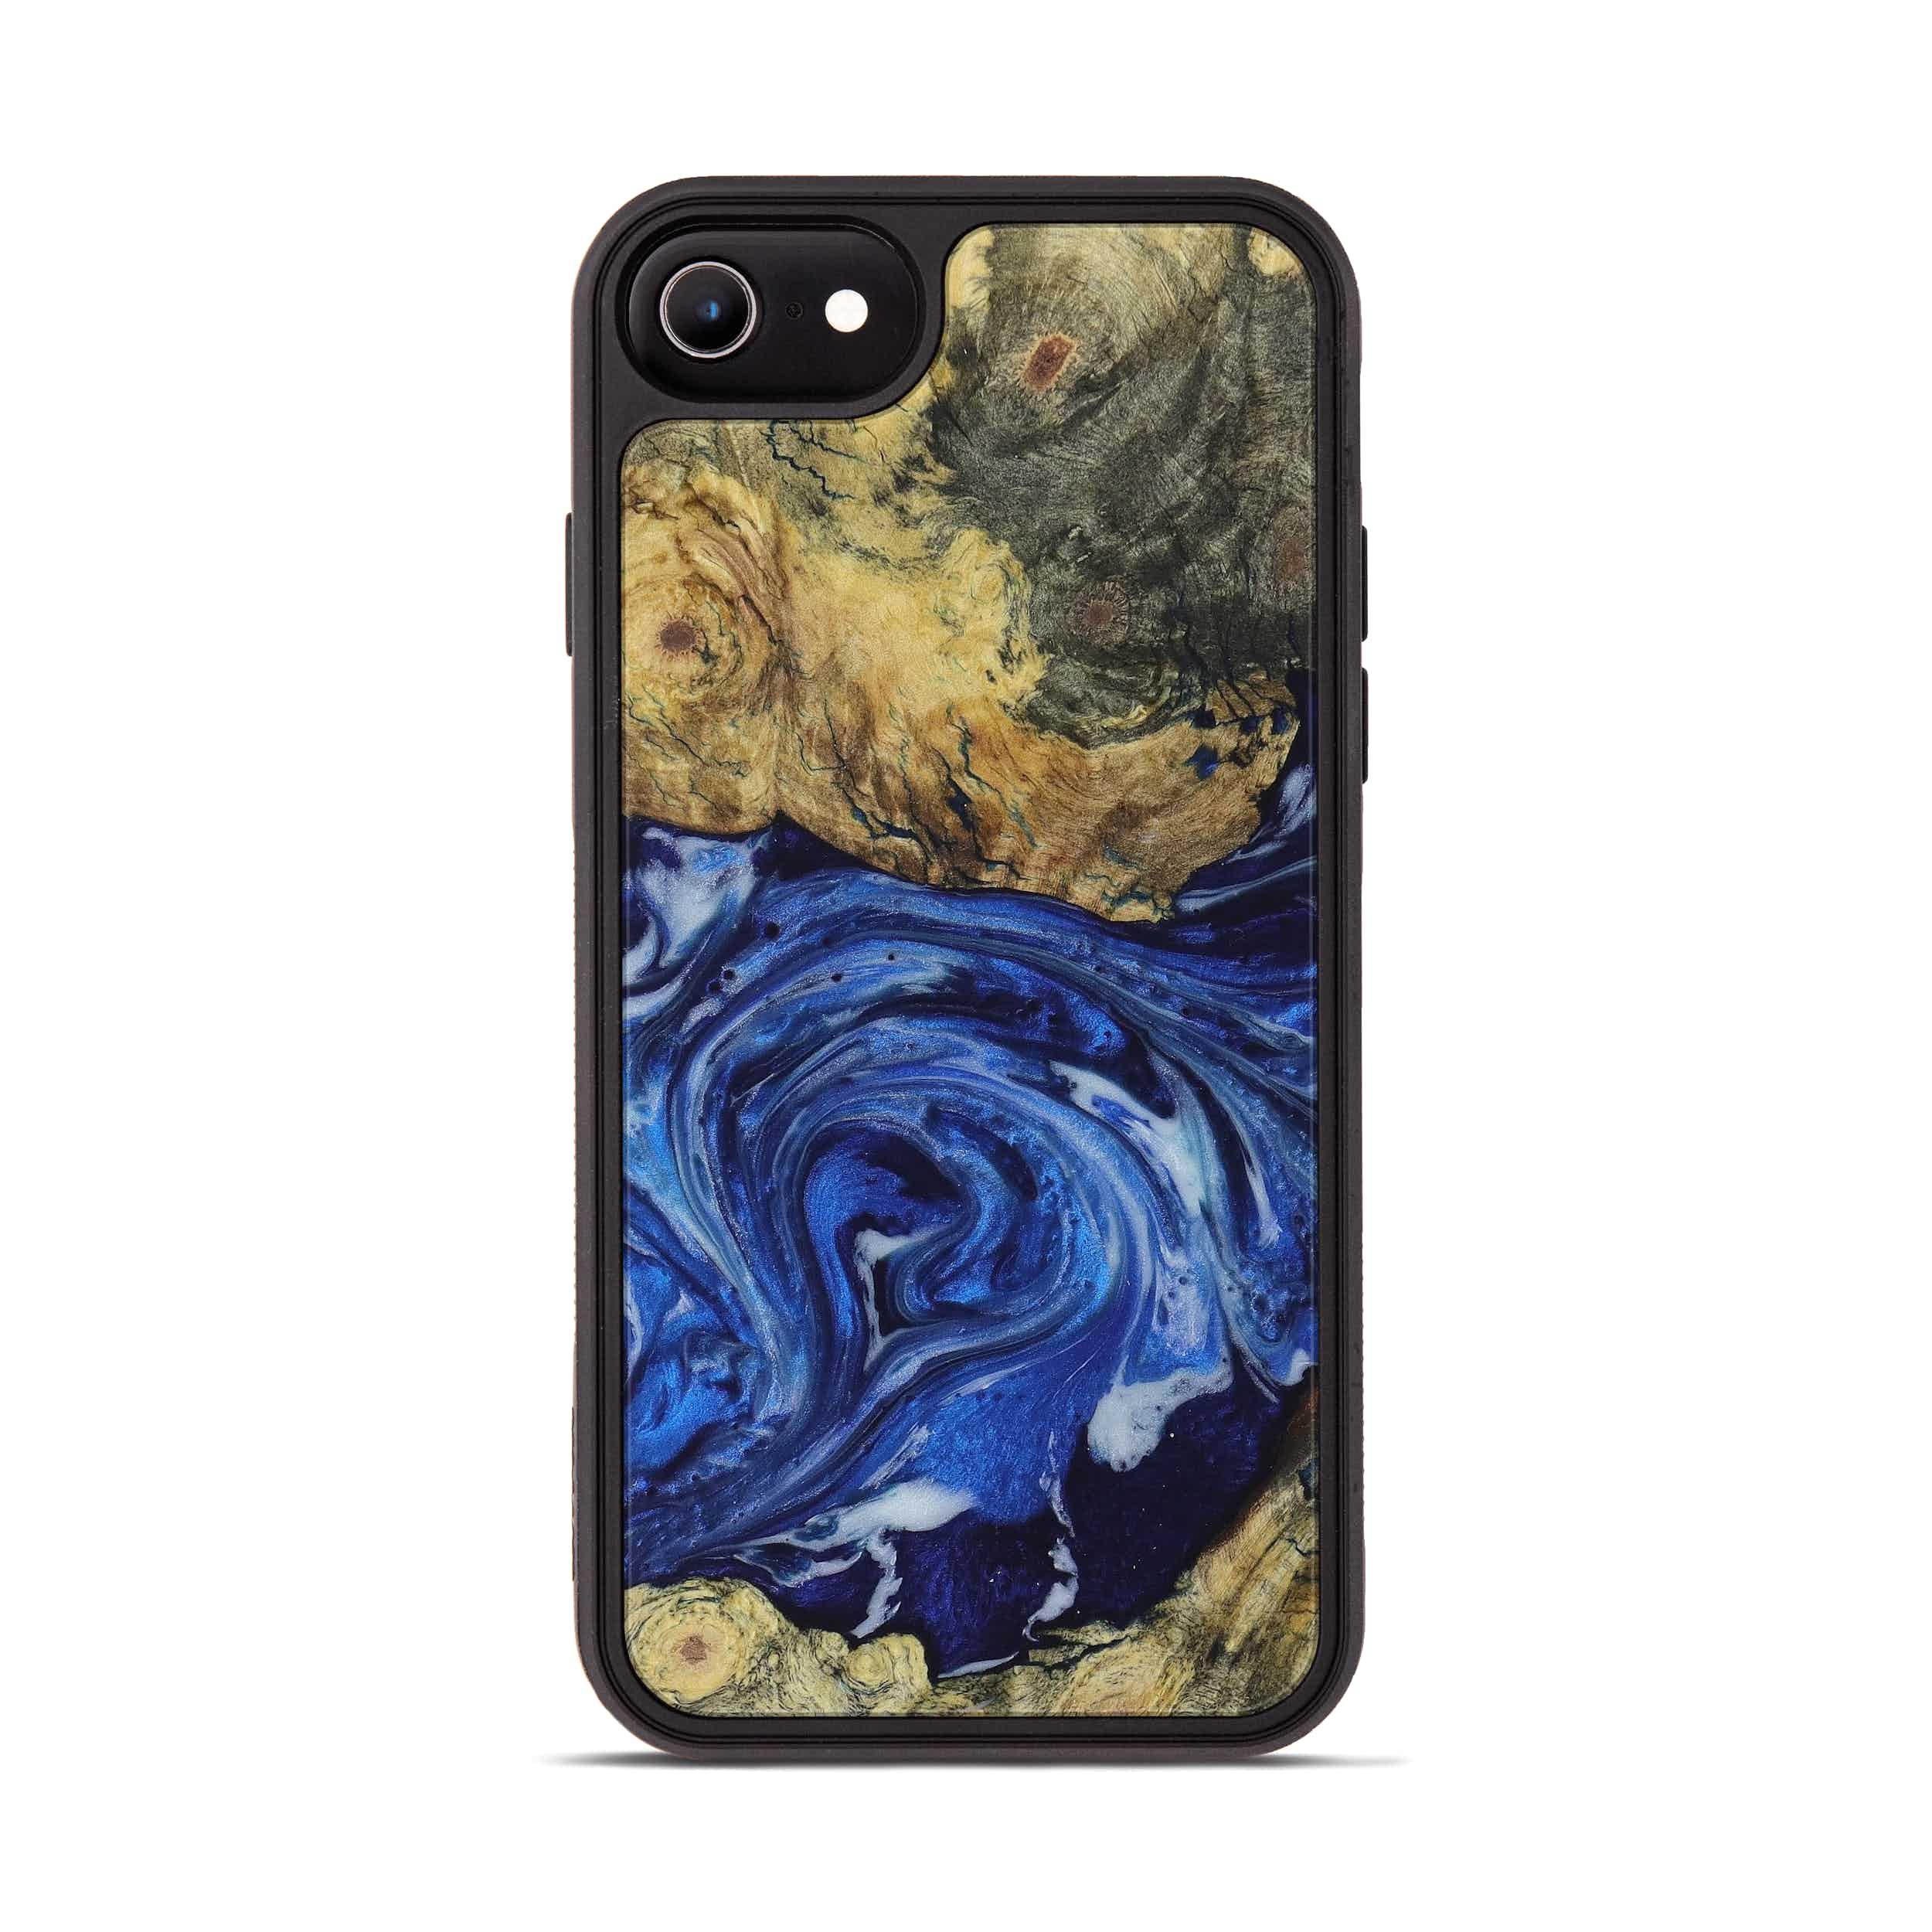 iPhone 6s Wood+Resin Phone Case - Shahid (Dark Blue, 396097)